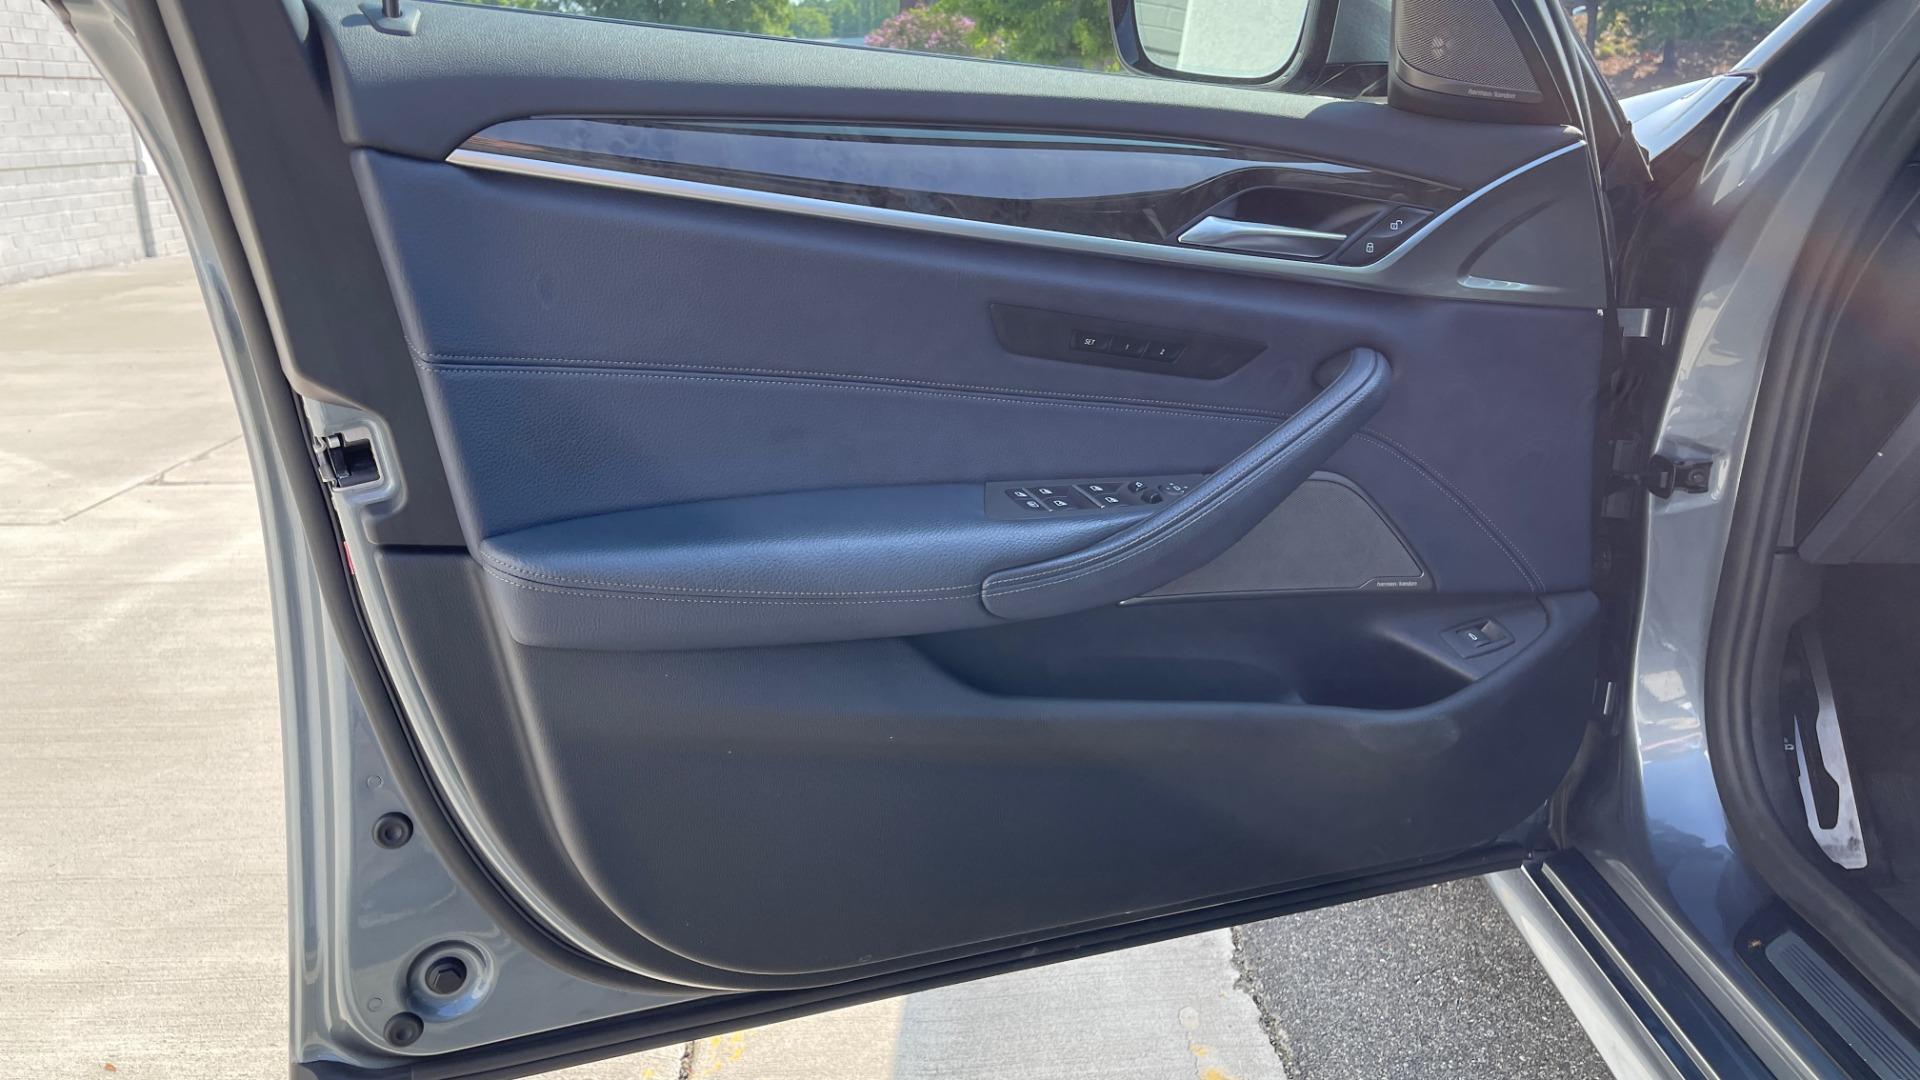 Used 2018 BMW 5 SERIES 540I XDRIVE M-SPORT / DRVR ASST / PDC / APPLE / HUD / H/K SND for sale $42,795 at Formula Imports in Charlotte NC 28227 25